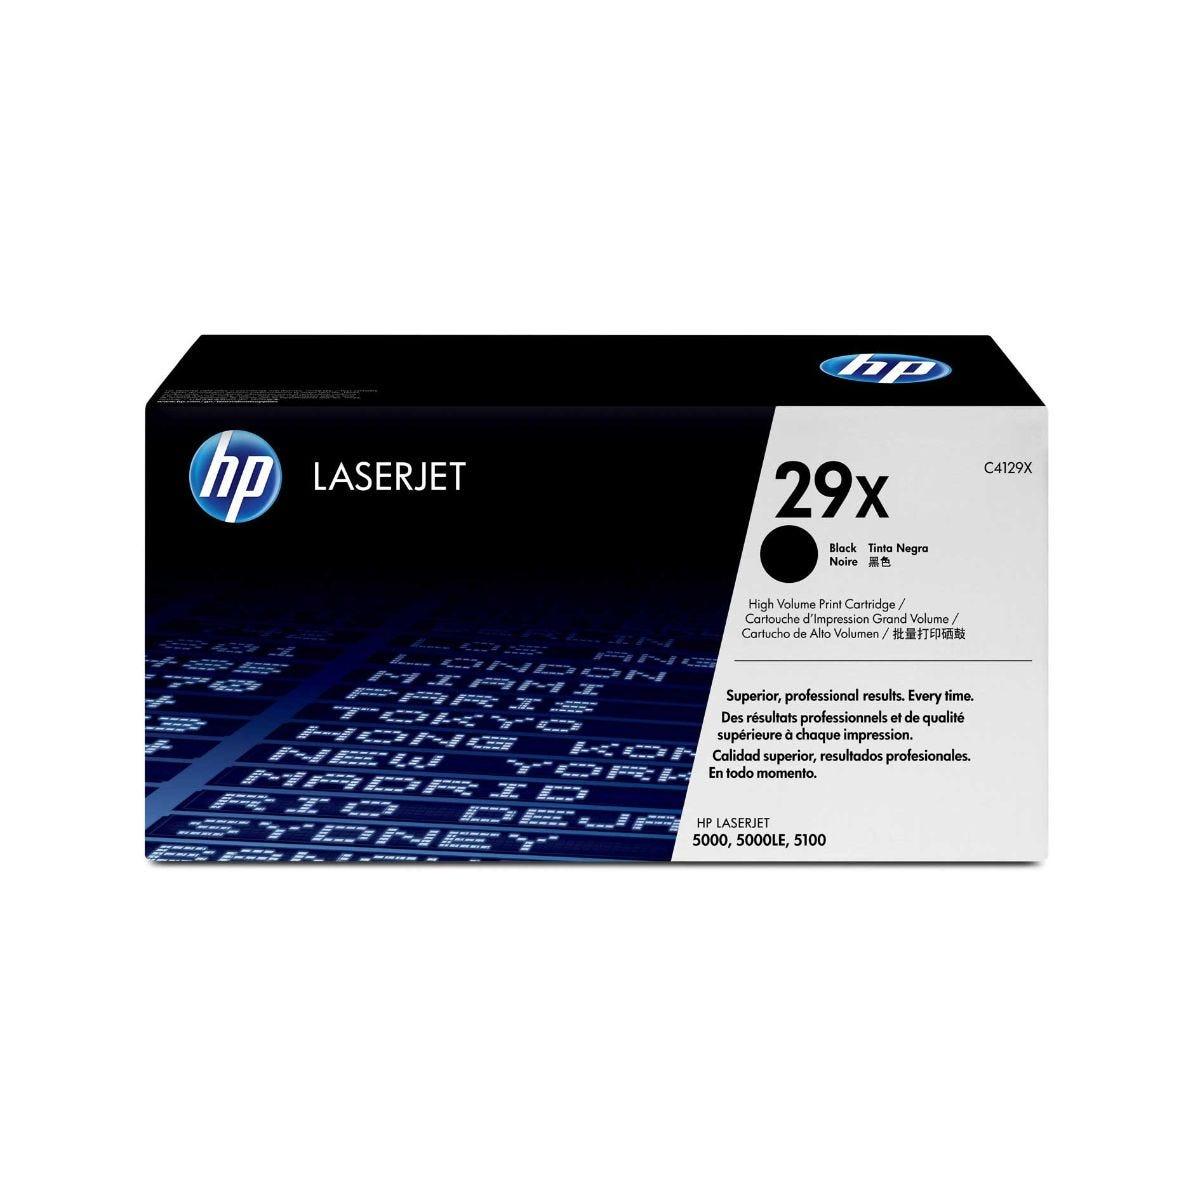 Image of HP 29X Laserjet Printer Ink Toner Cartridge C4129X, Black